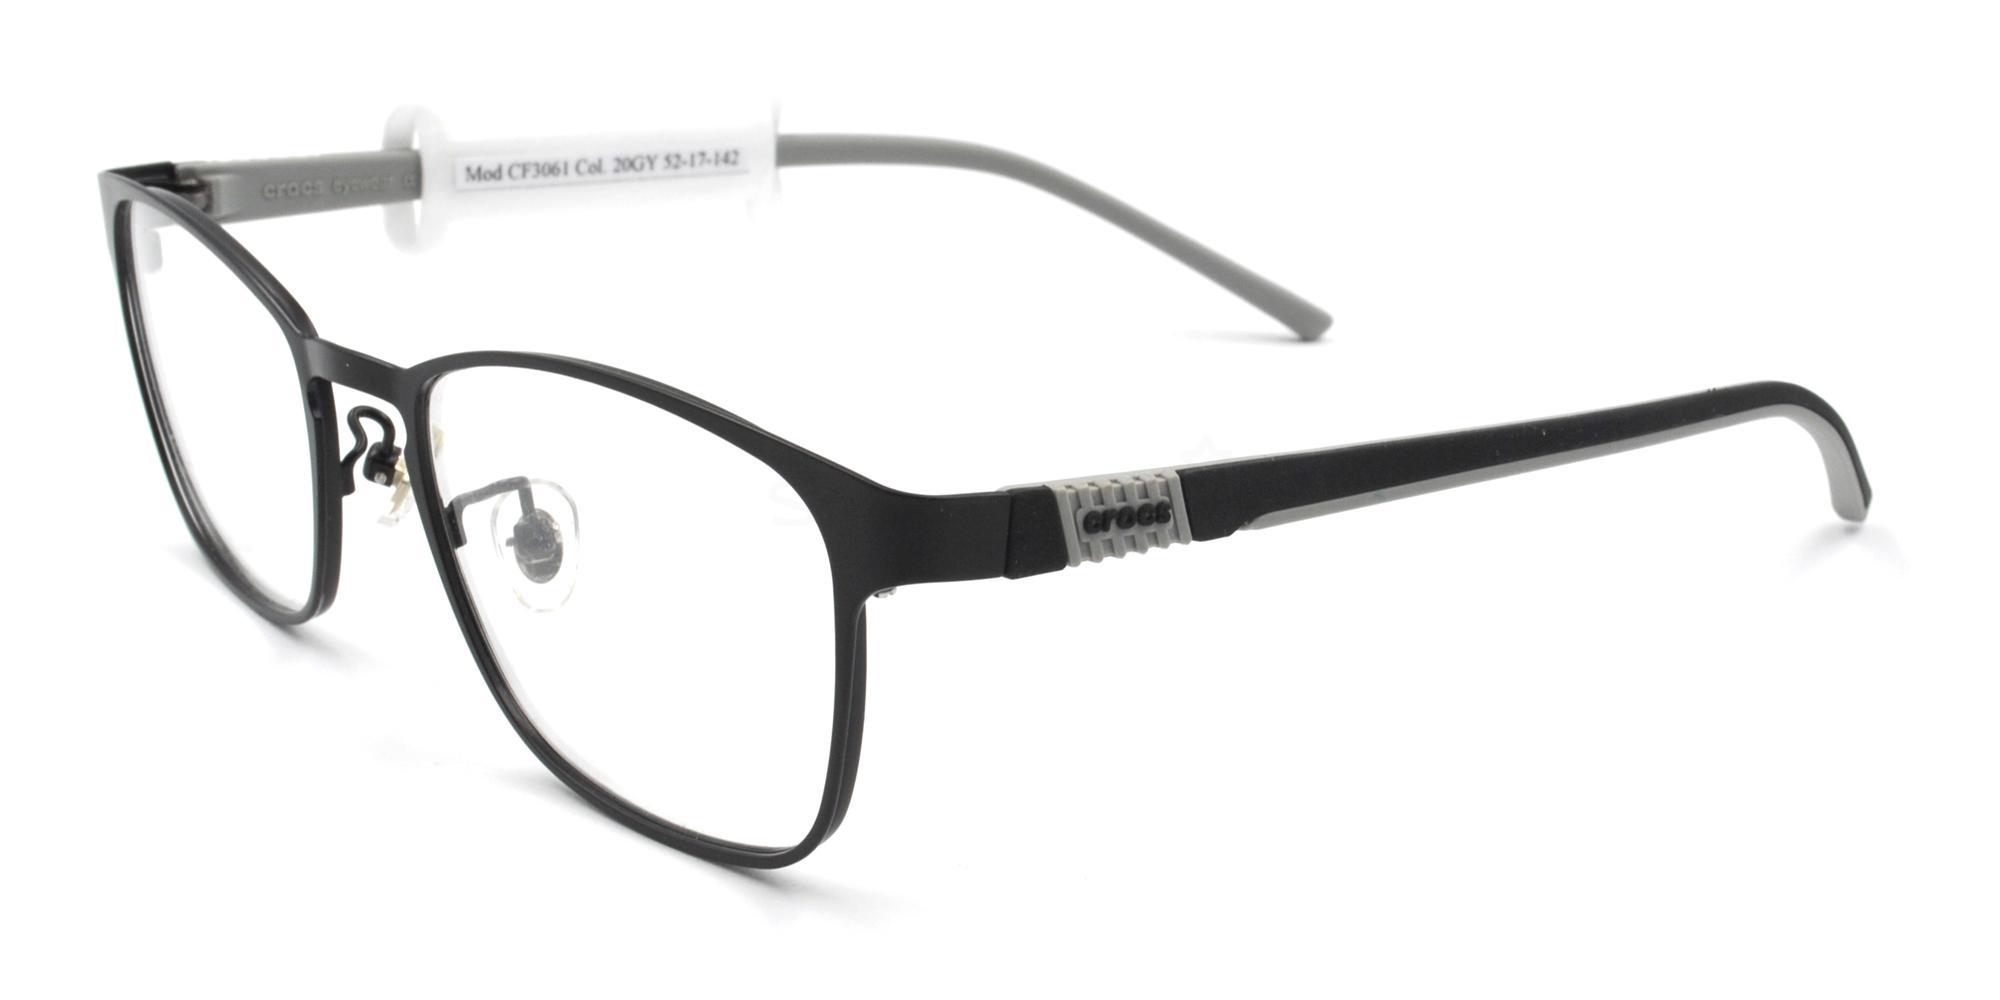 20GY CF3061 Glasses, Crocs Eyewear